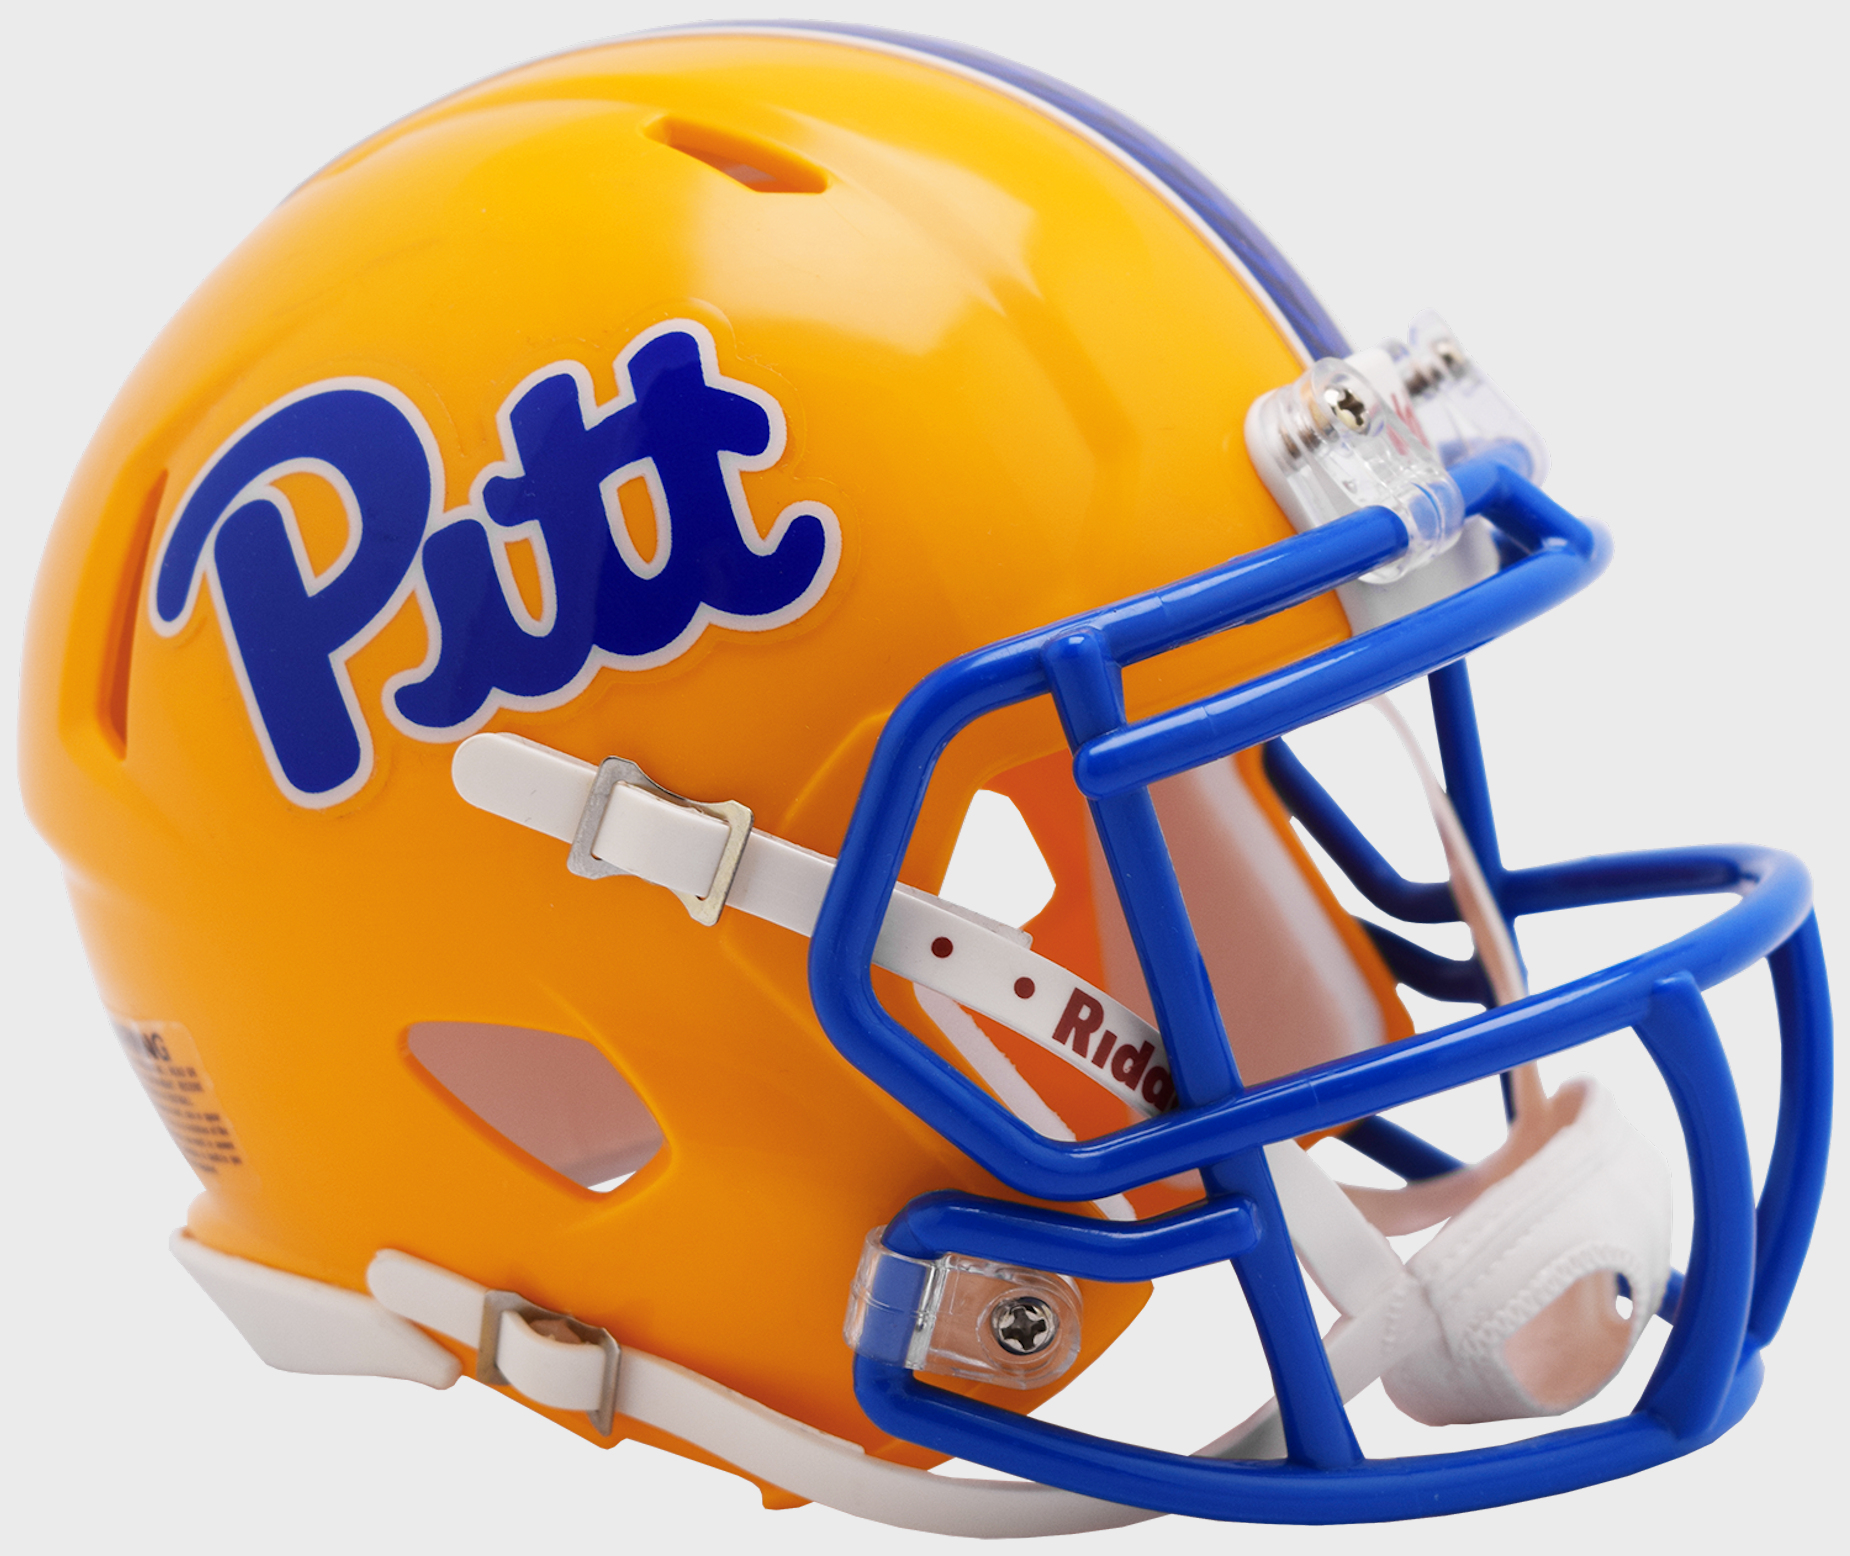 Pittsburgh Panthers NCAA Mini Speed Football Helmet <B>2019 Gold</B>